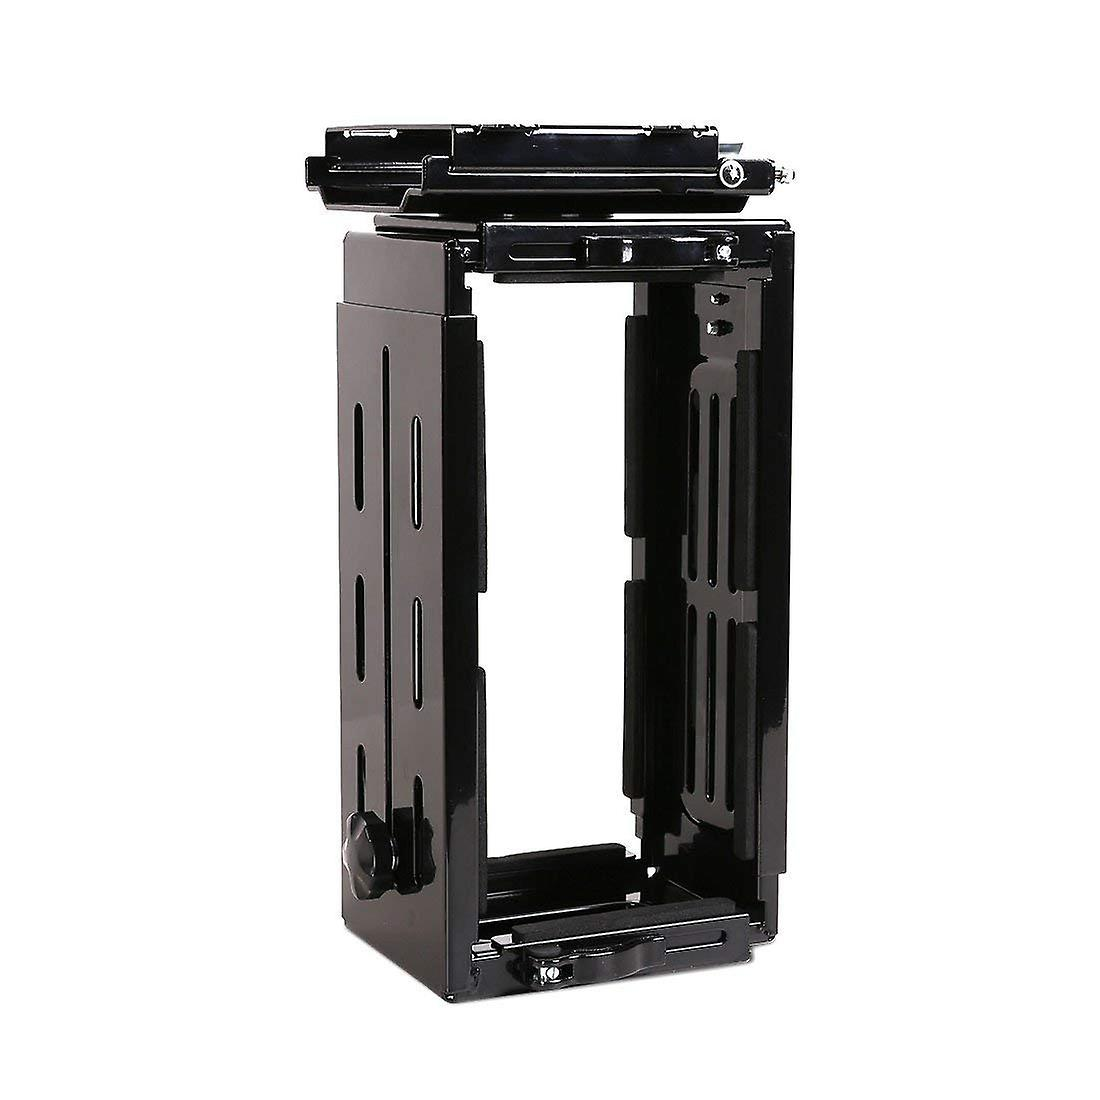 Flexispot Adjustable Under Desk Cpu Mount 180-Degree Swivel Cpu Holder Desk And Floor Space Saving.